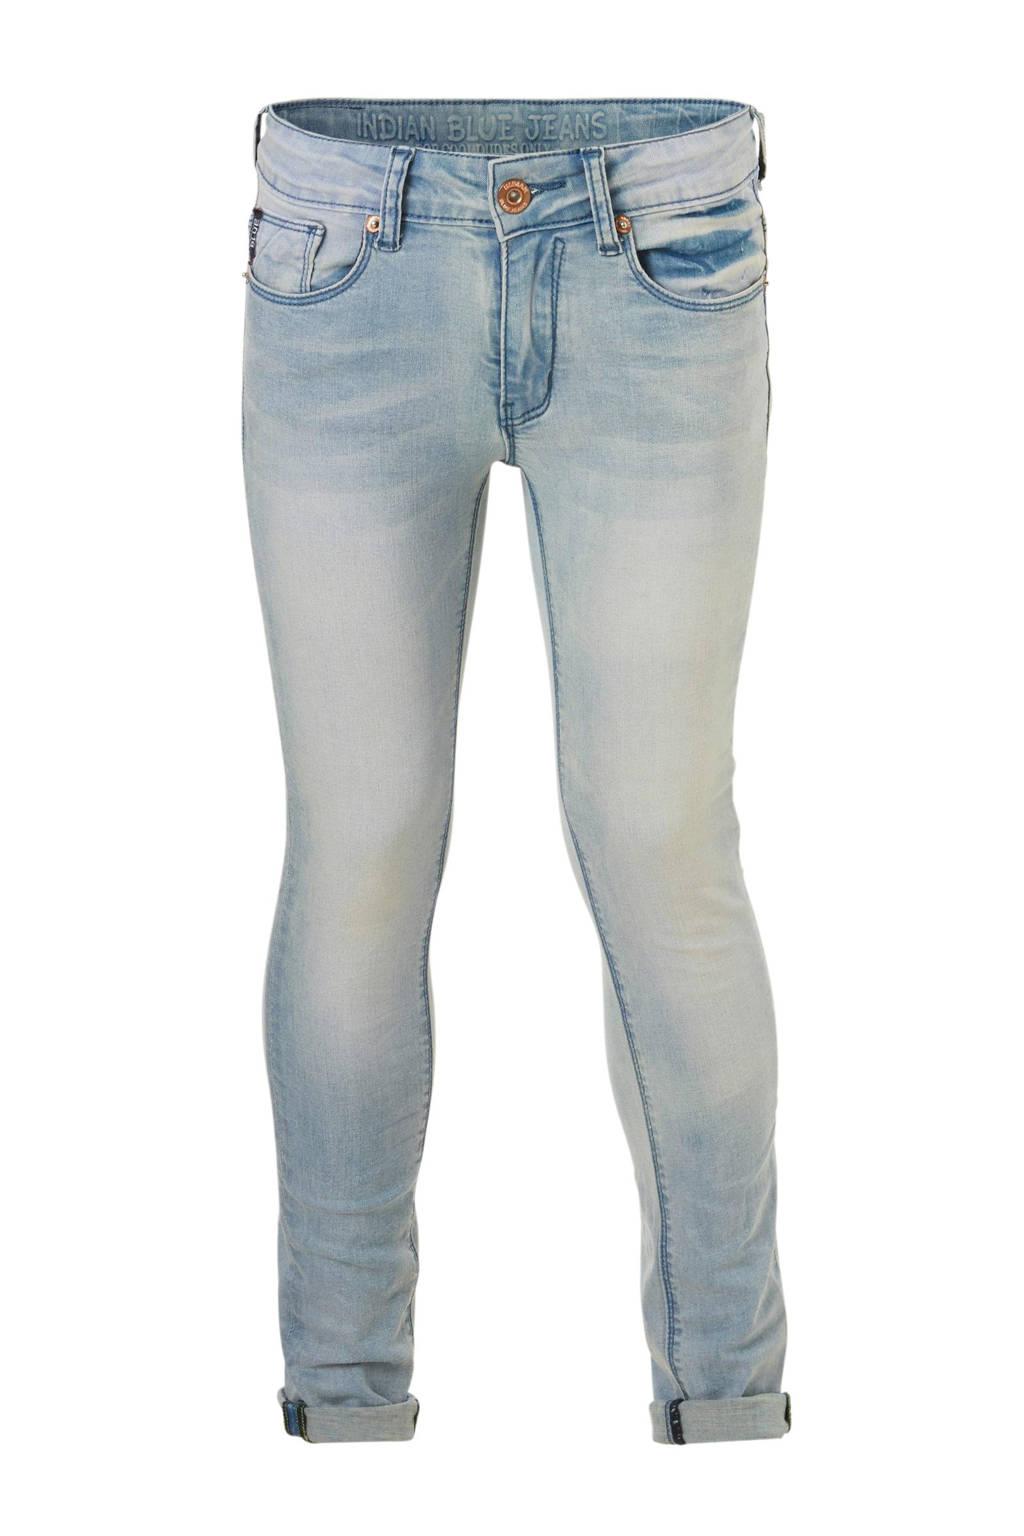 Indian Blue Jeans skinny fit jeans Ryan lichtblauw, Lichtblauw